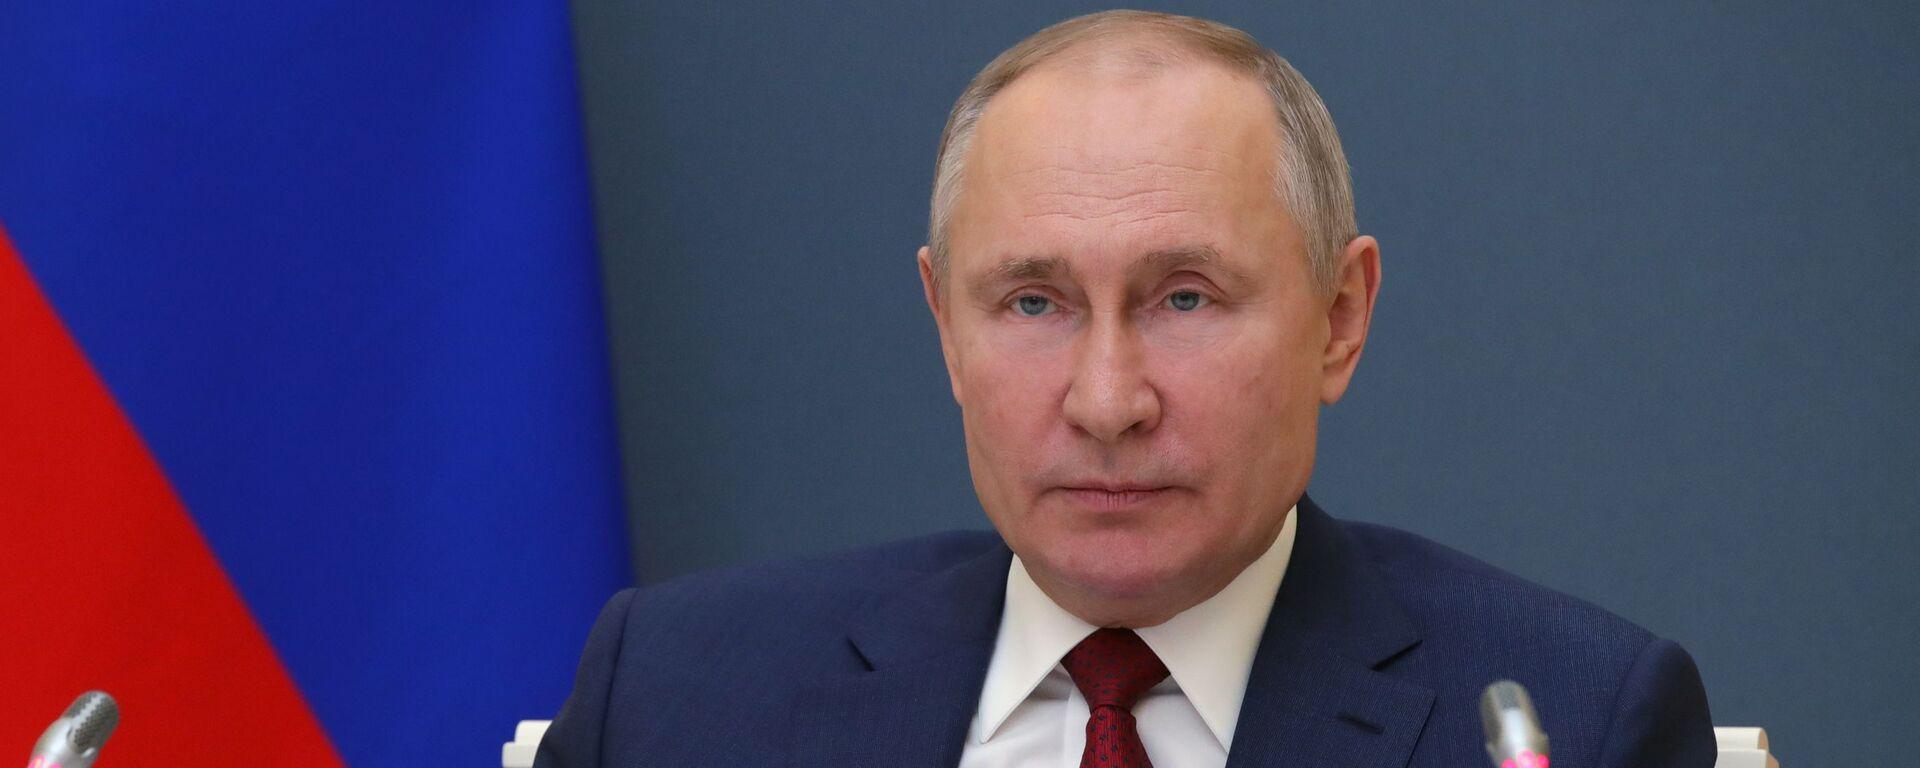 Президент РФ В. Путин выступил на сессии онлайн-форума Давосская повестка дня 2021 - Sputnik Таджикистан, 1920, 10.06.2021